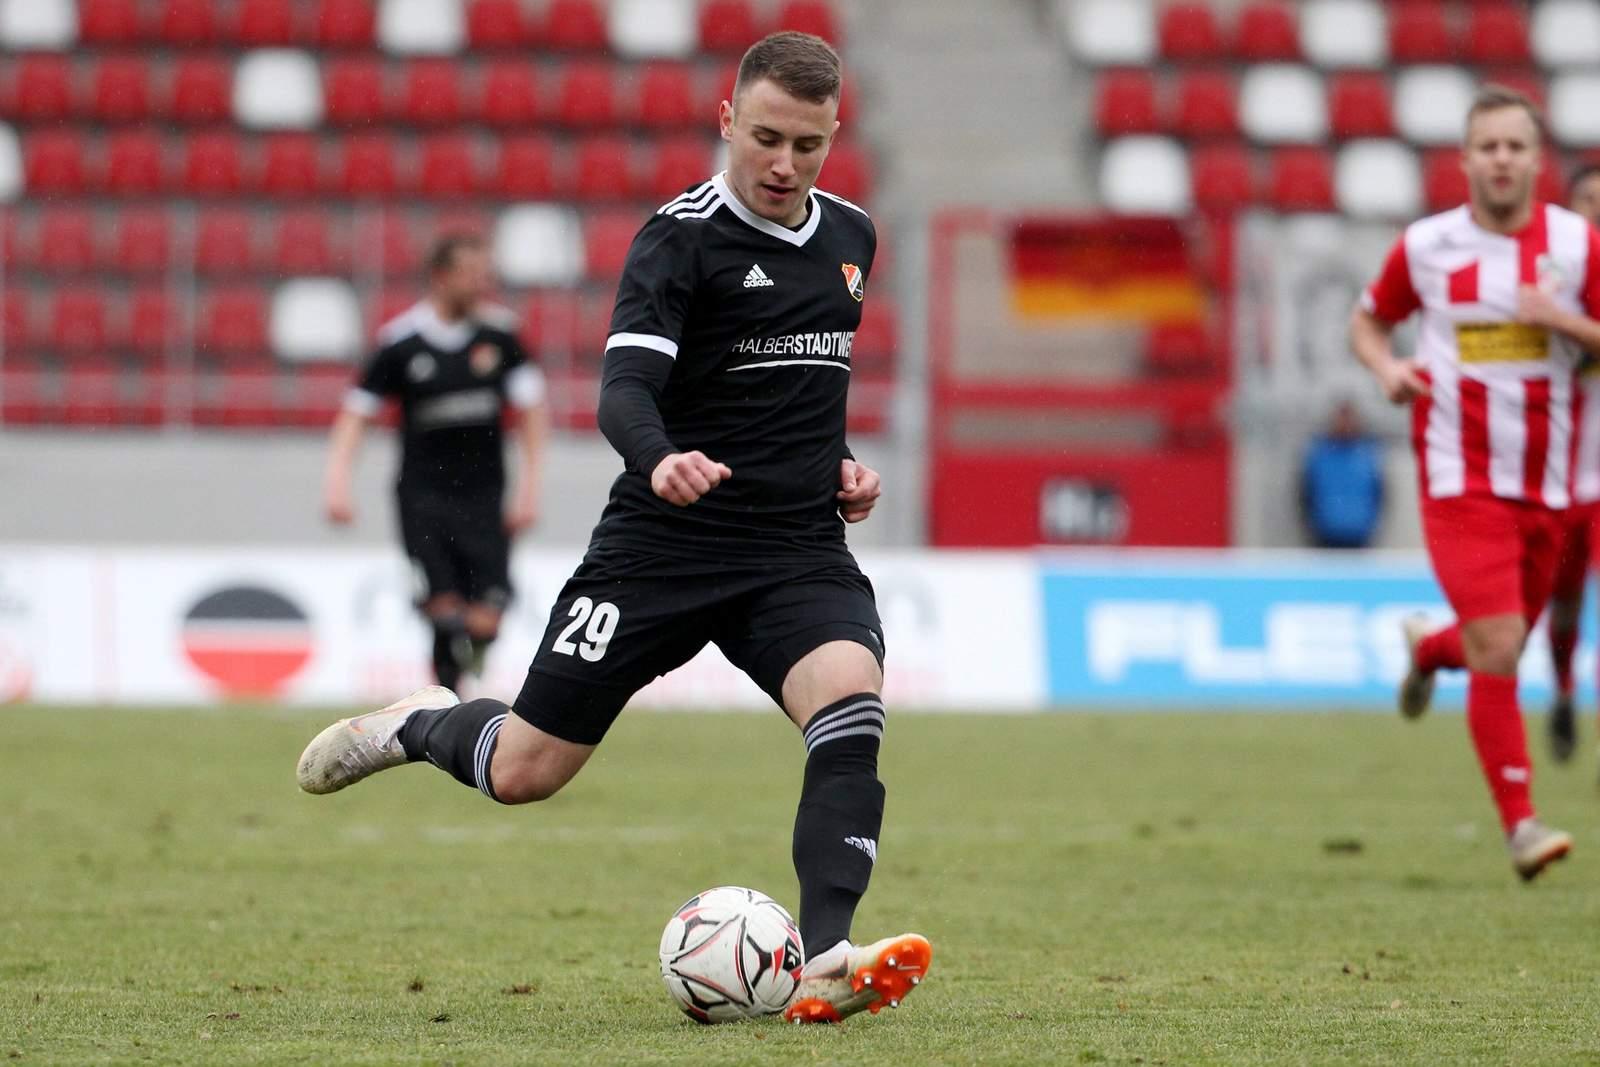 Denis Jäpel am Ball für Germania Halberstadt